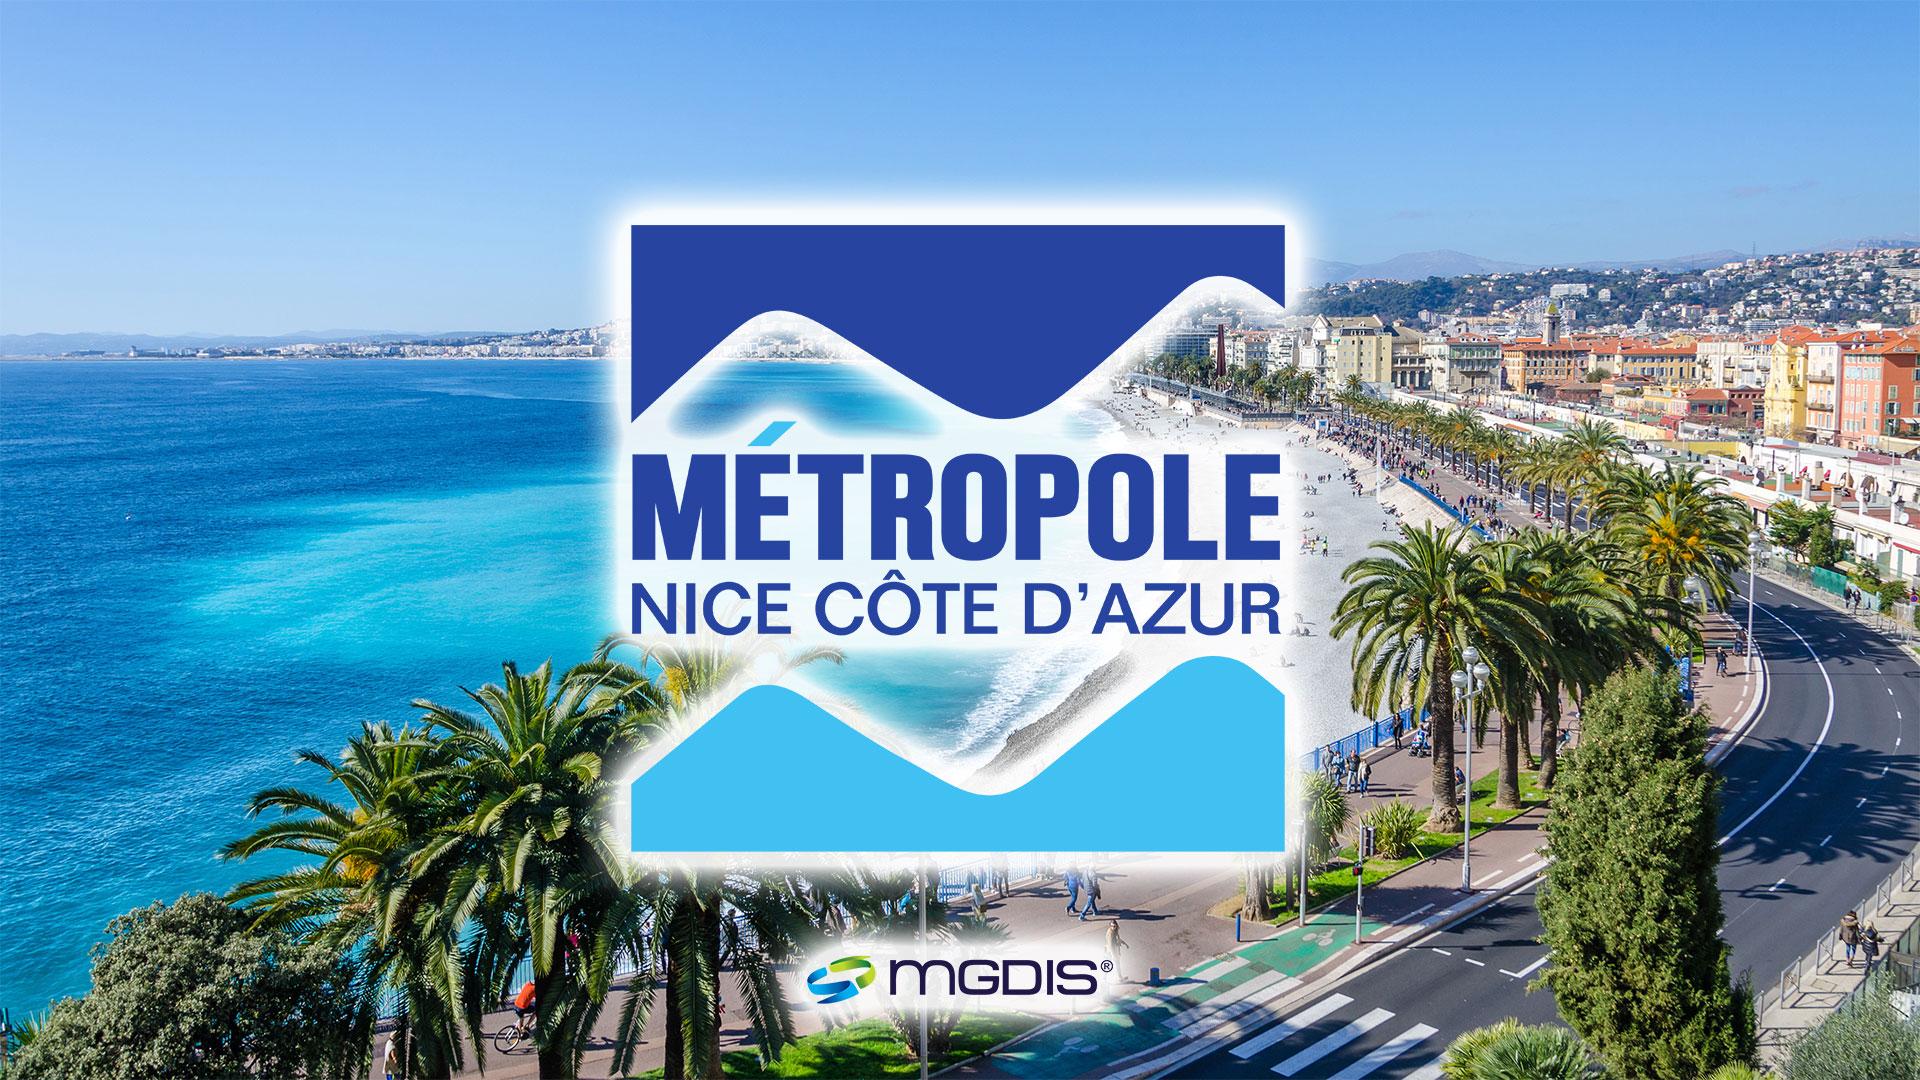 MGDIS-metropole-nice-cote-azur